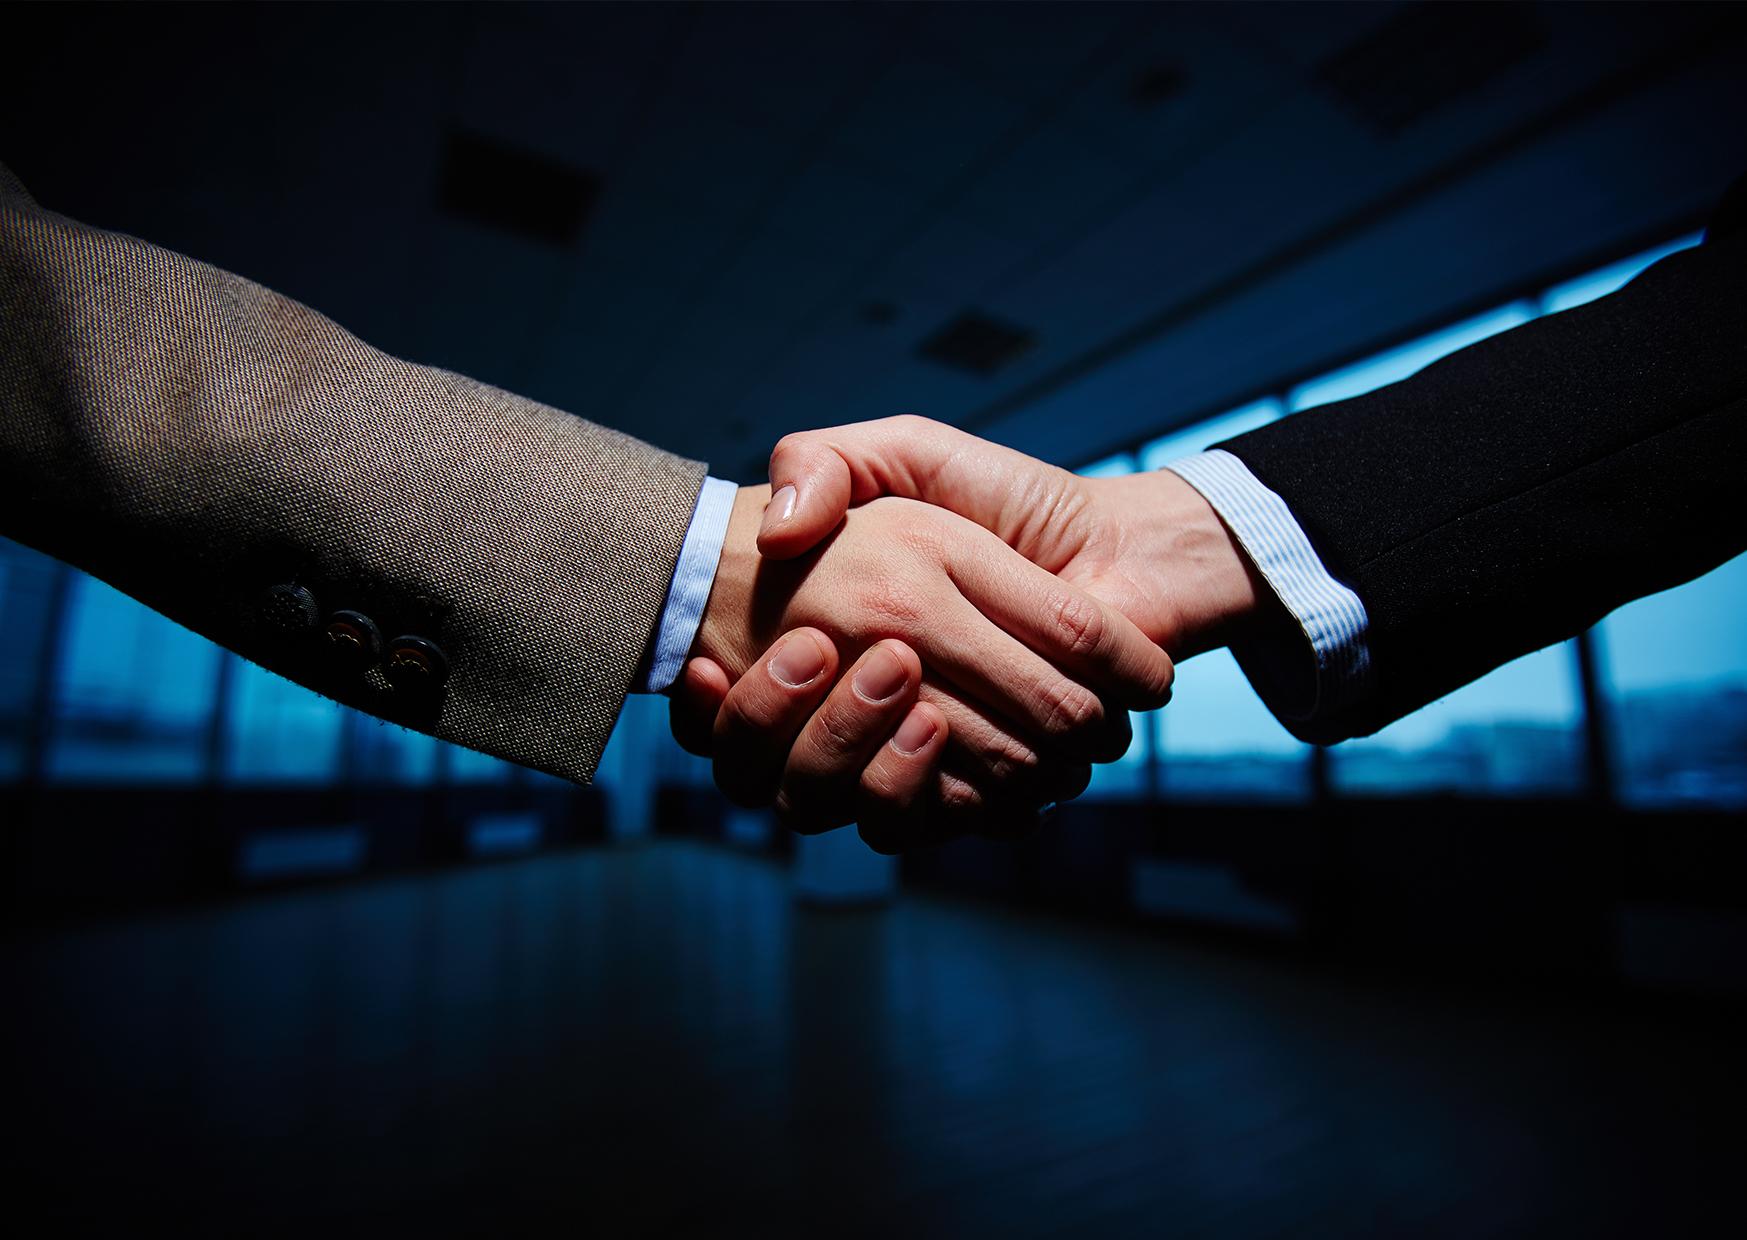 Automa ed END CORR: nuova partnership